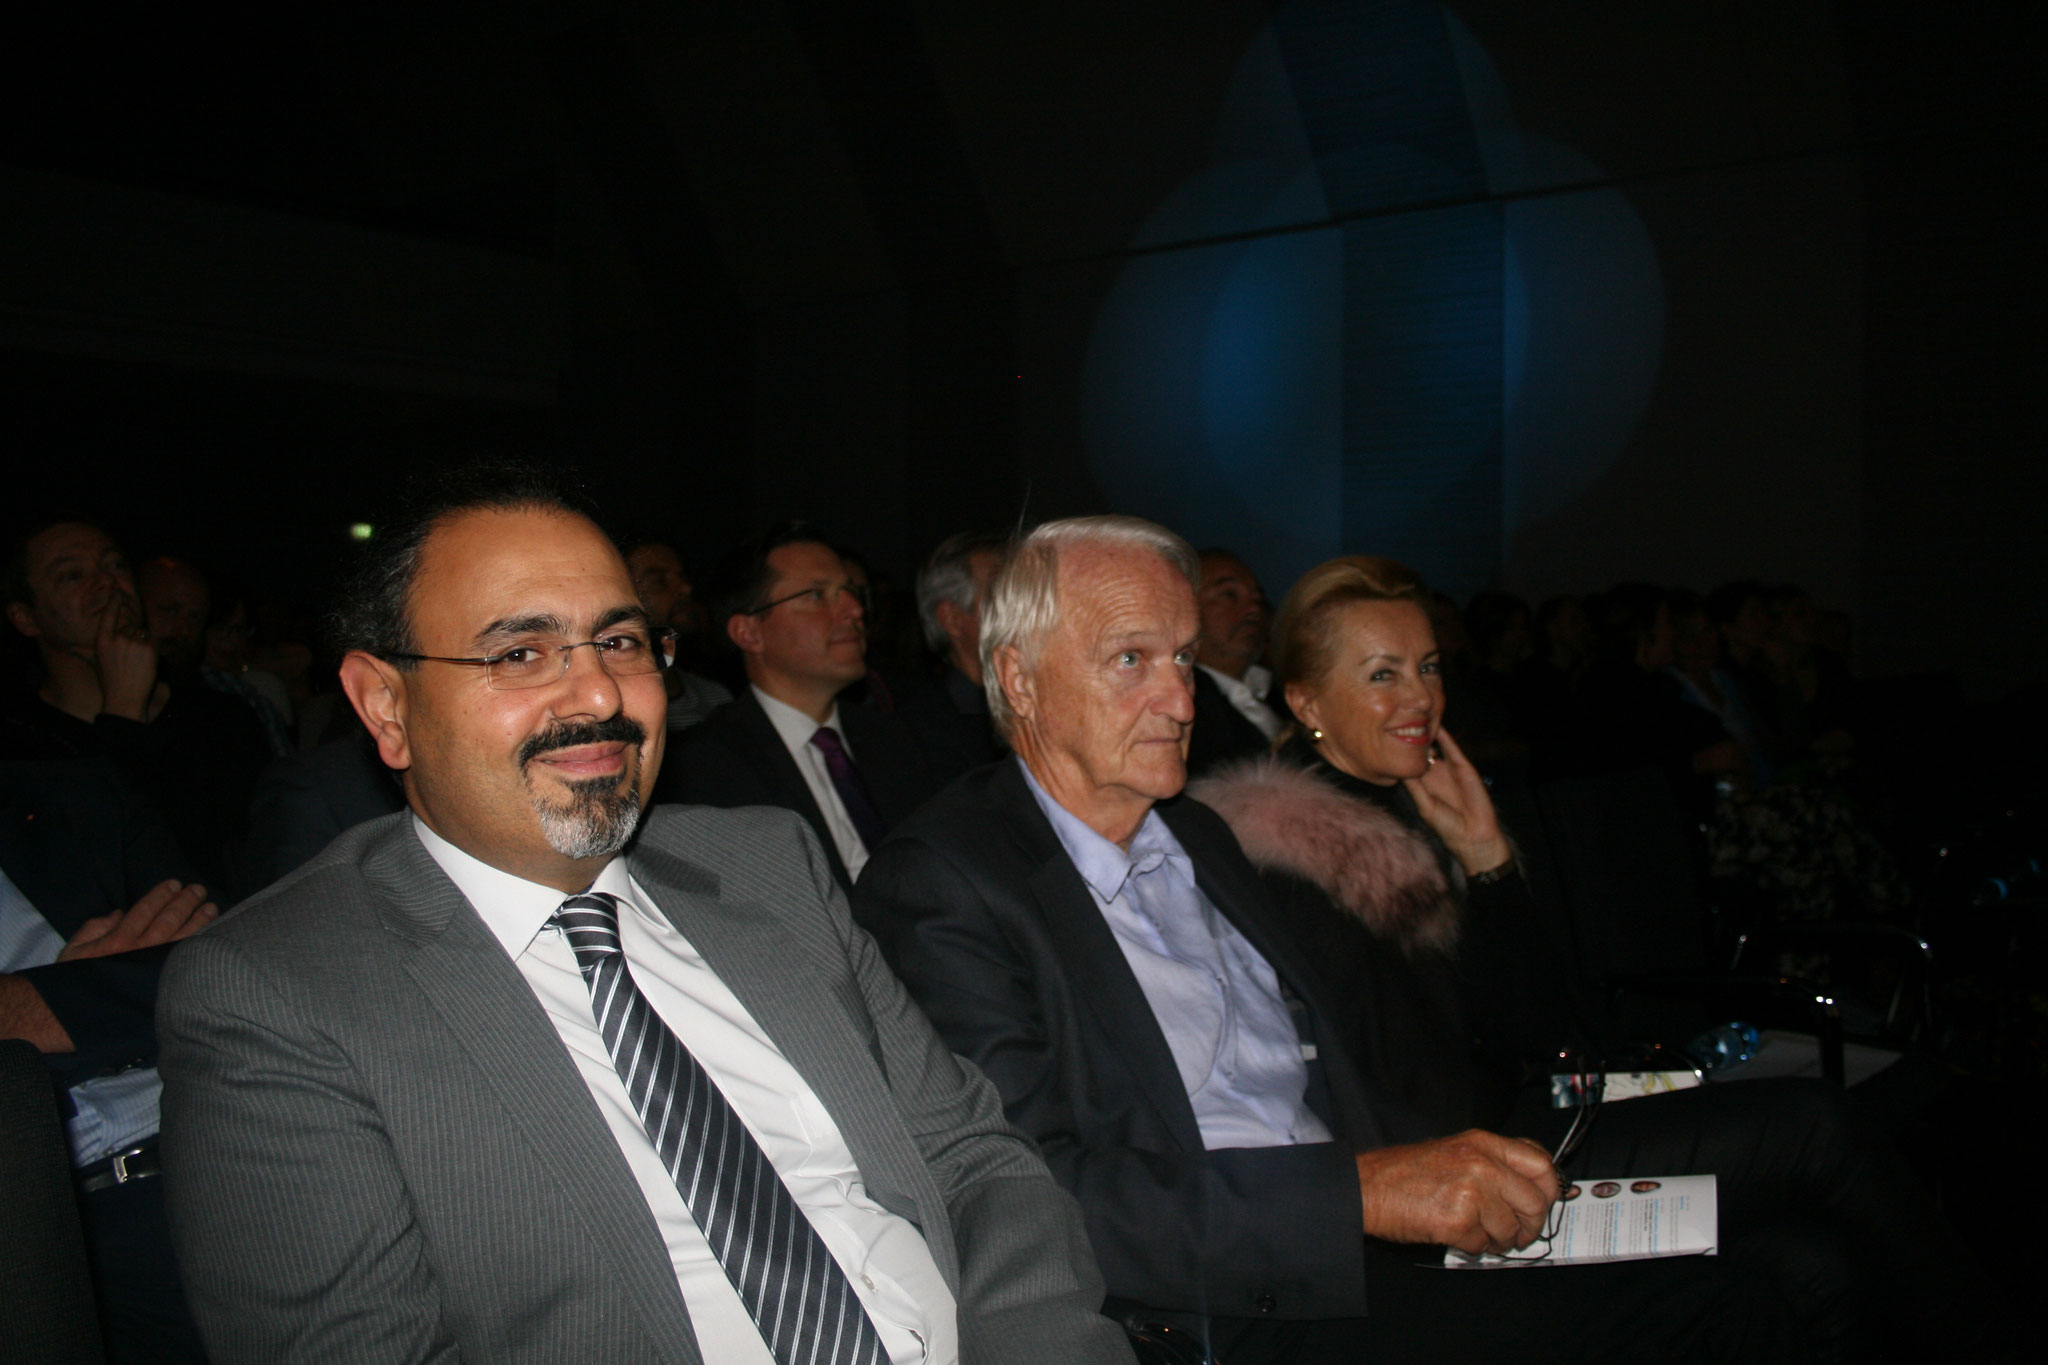 v.l.n.r.: Kurosch Yazdi, Werner Schöny, Karin Schöny